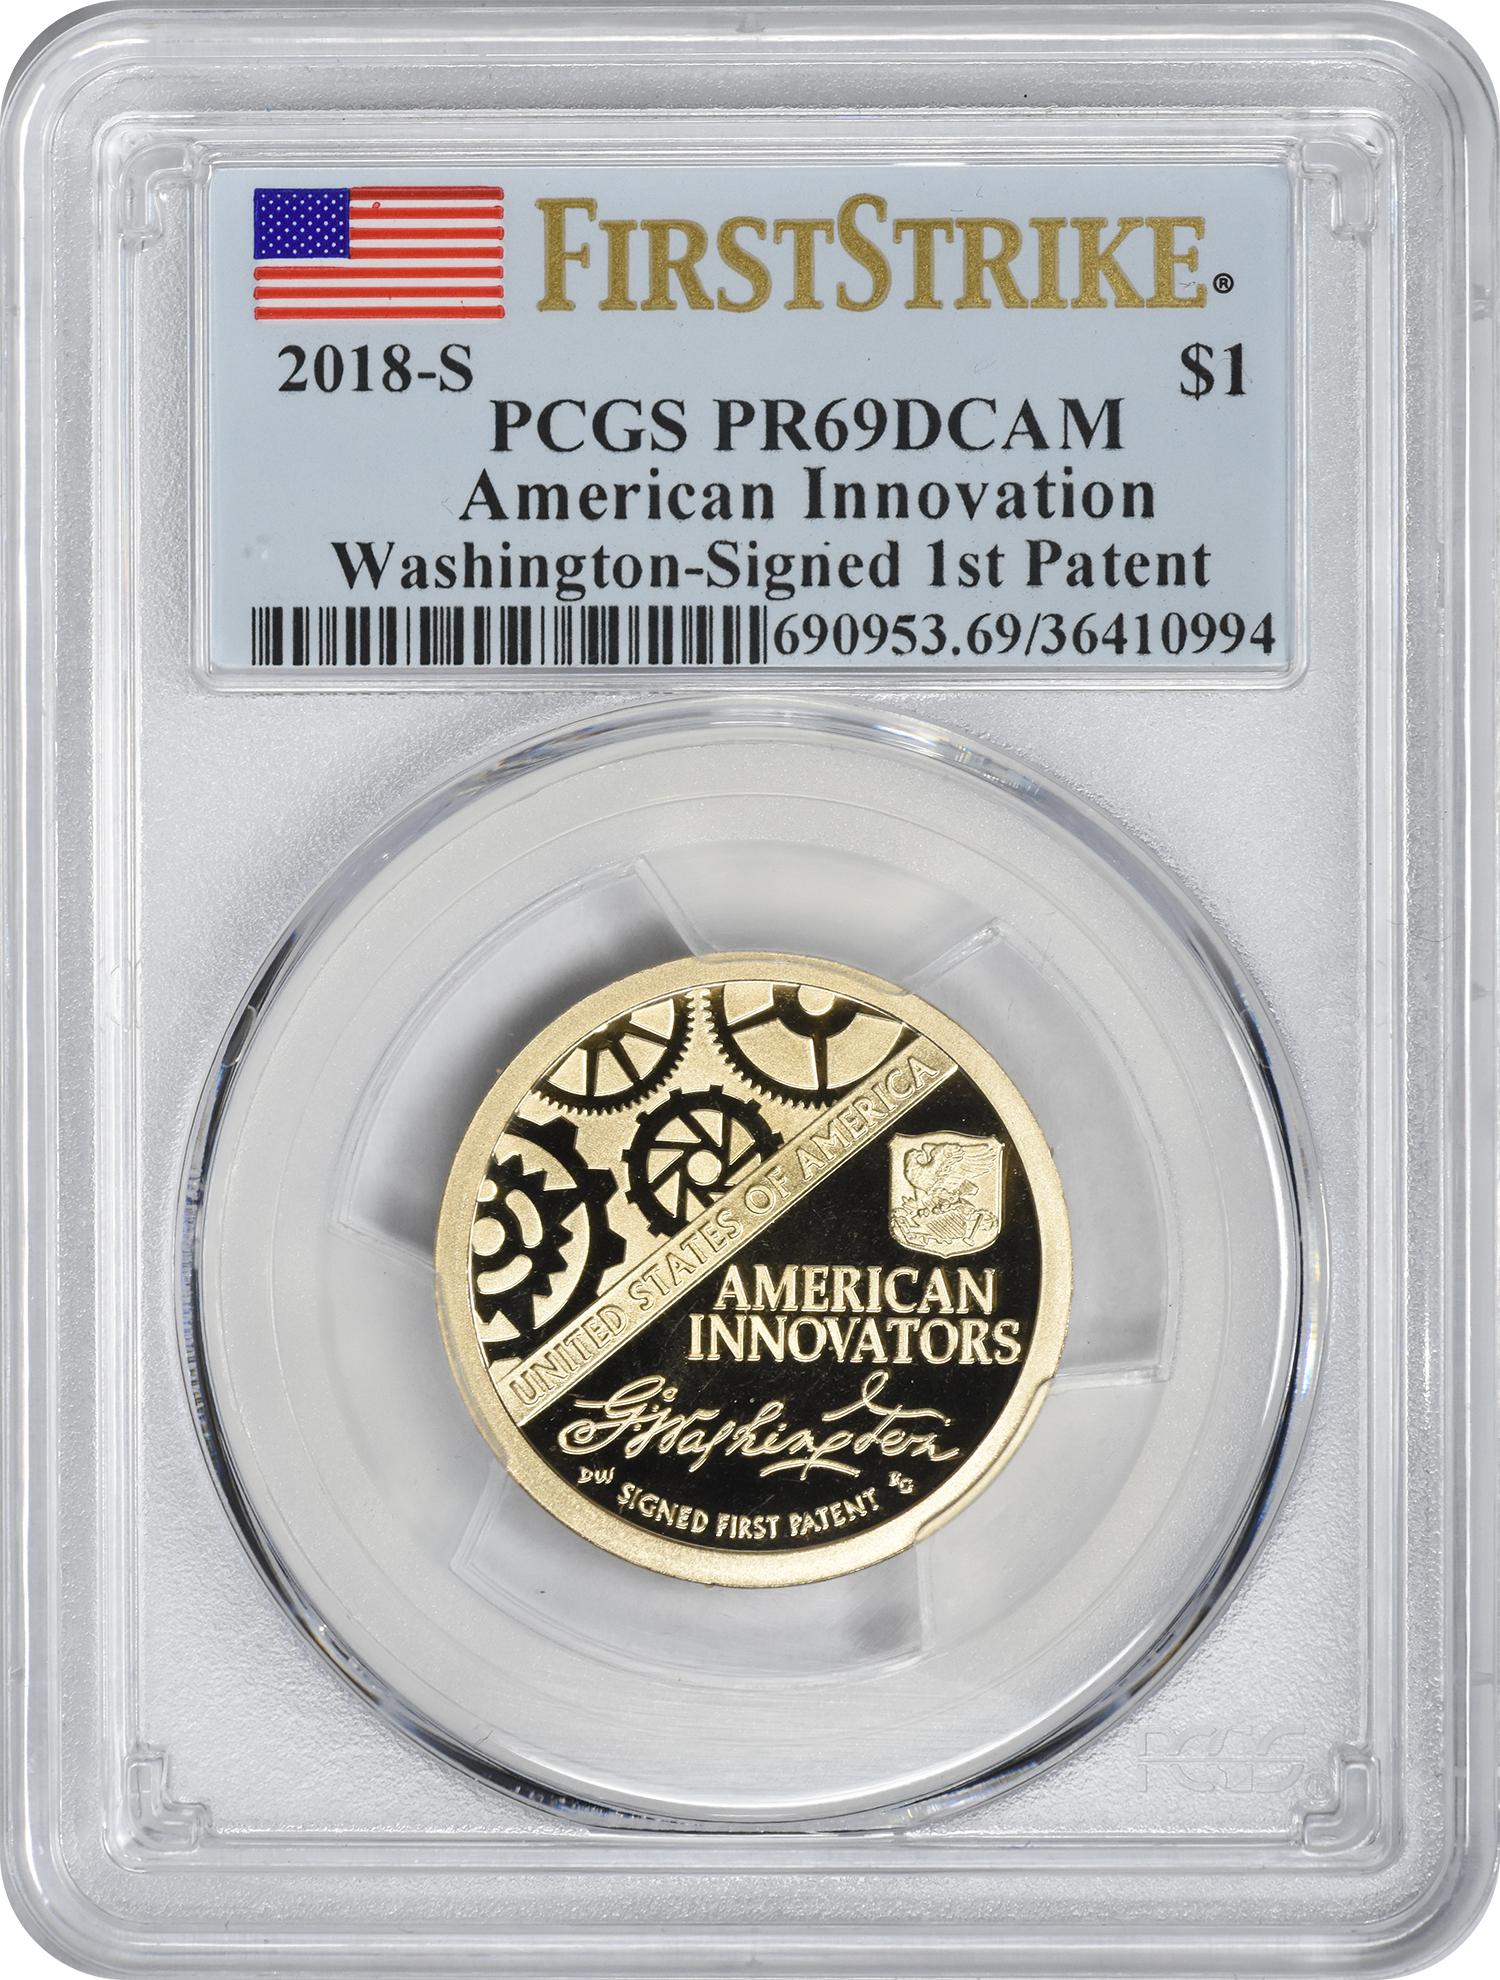 2018-S American Innovation Dollar Washington Signed 1st Patent PR69DCAM First Strike PCGS